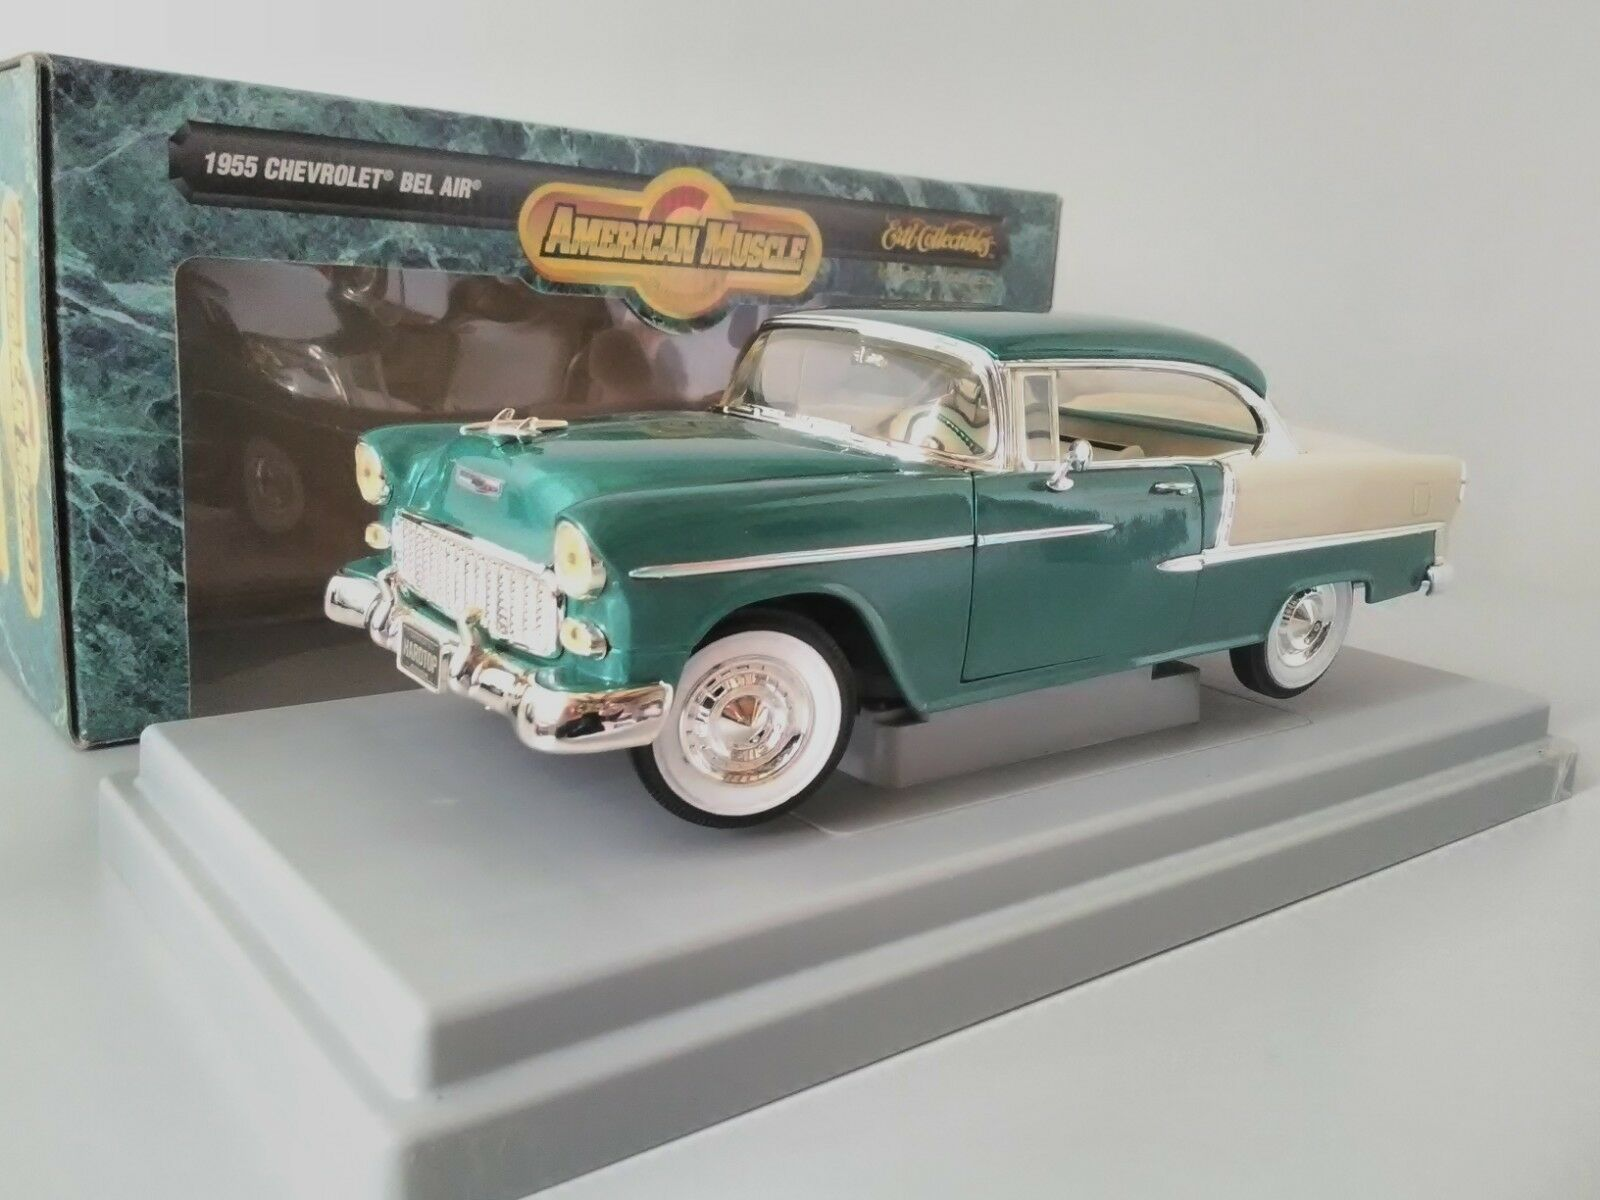 Chevrolet Bel Air 1955, ERTL 1 18